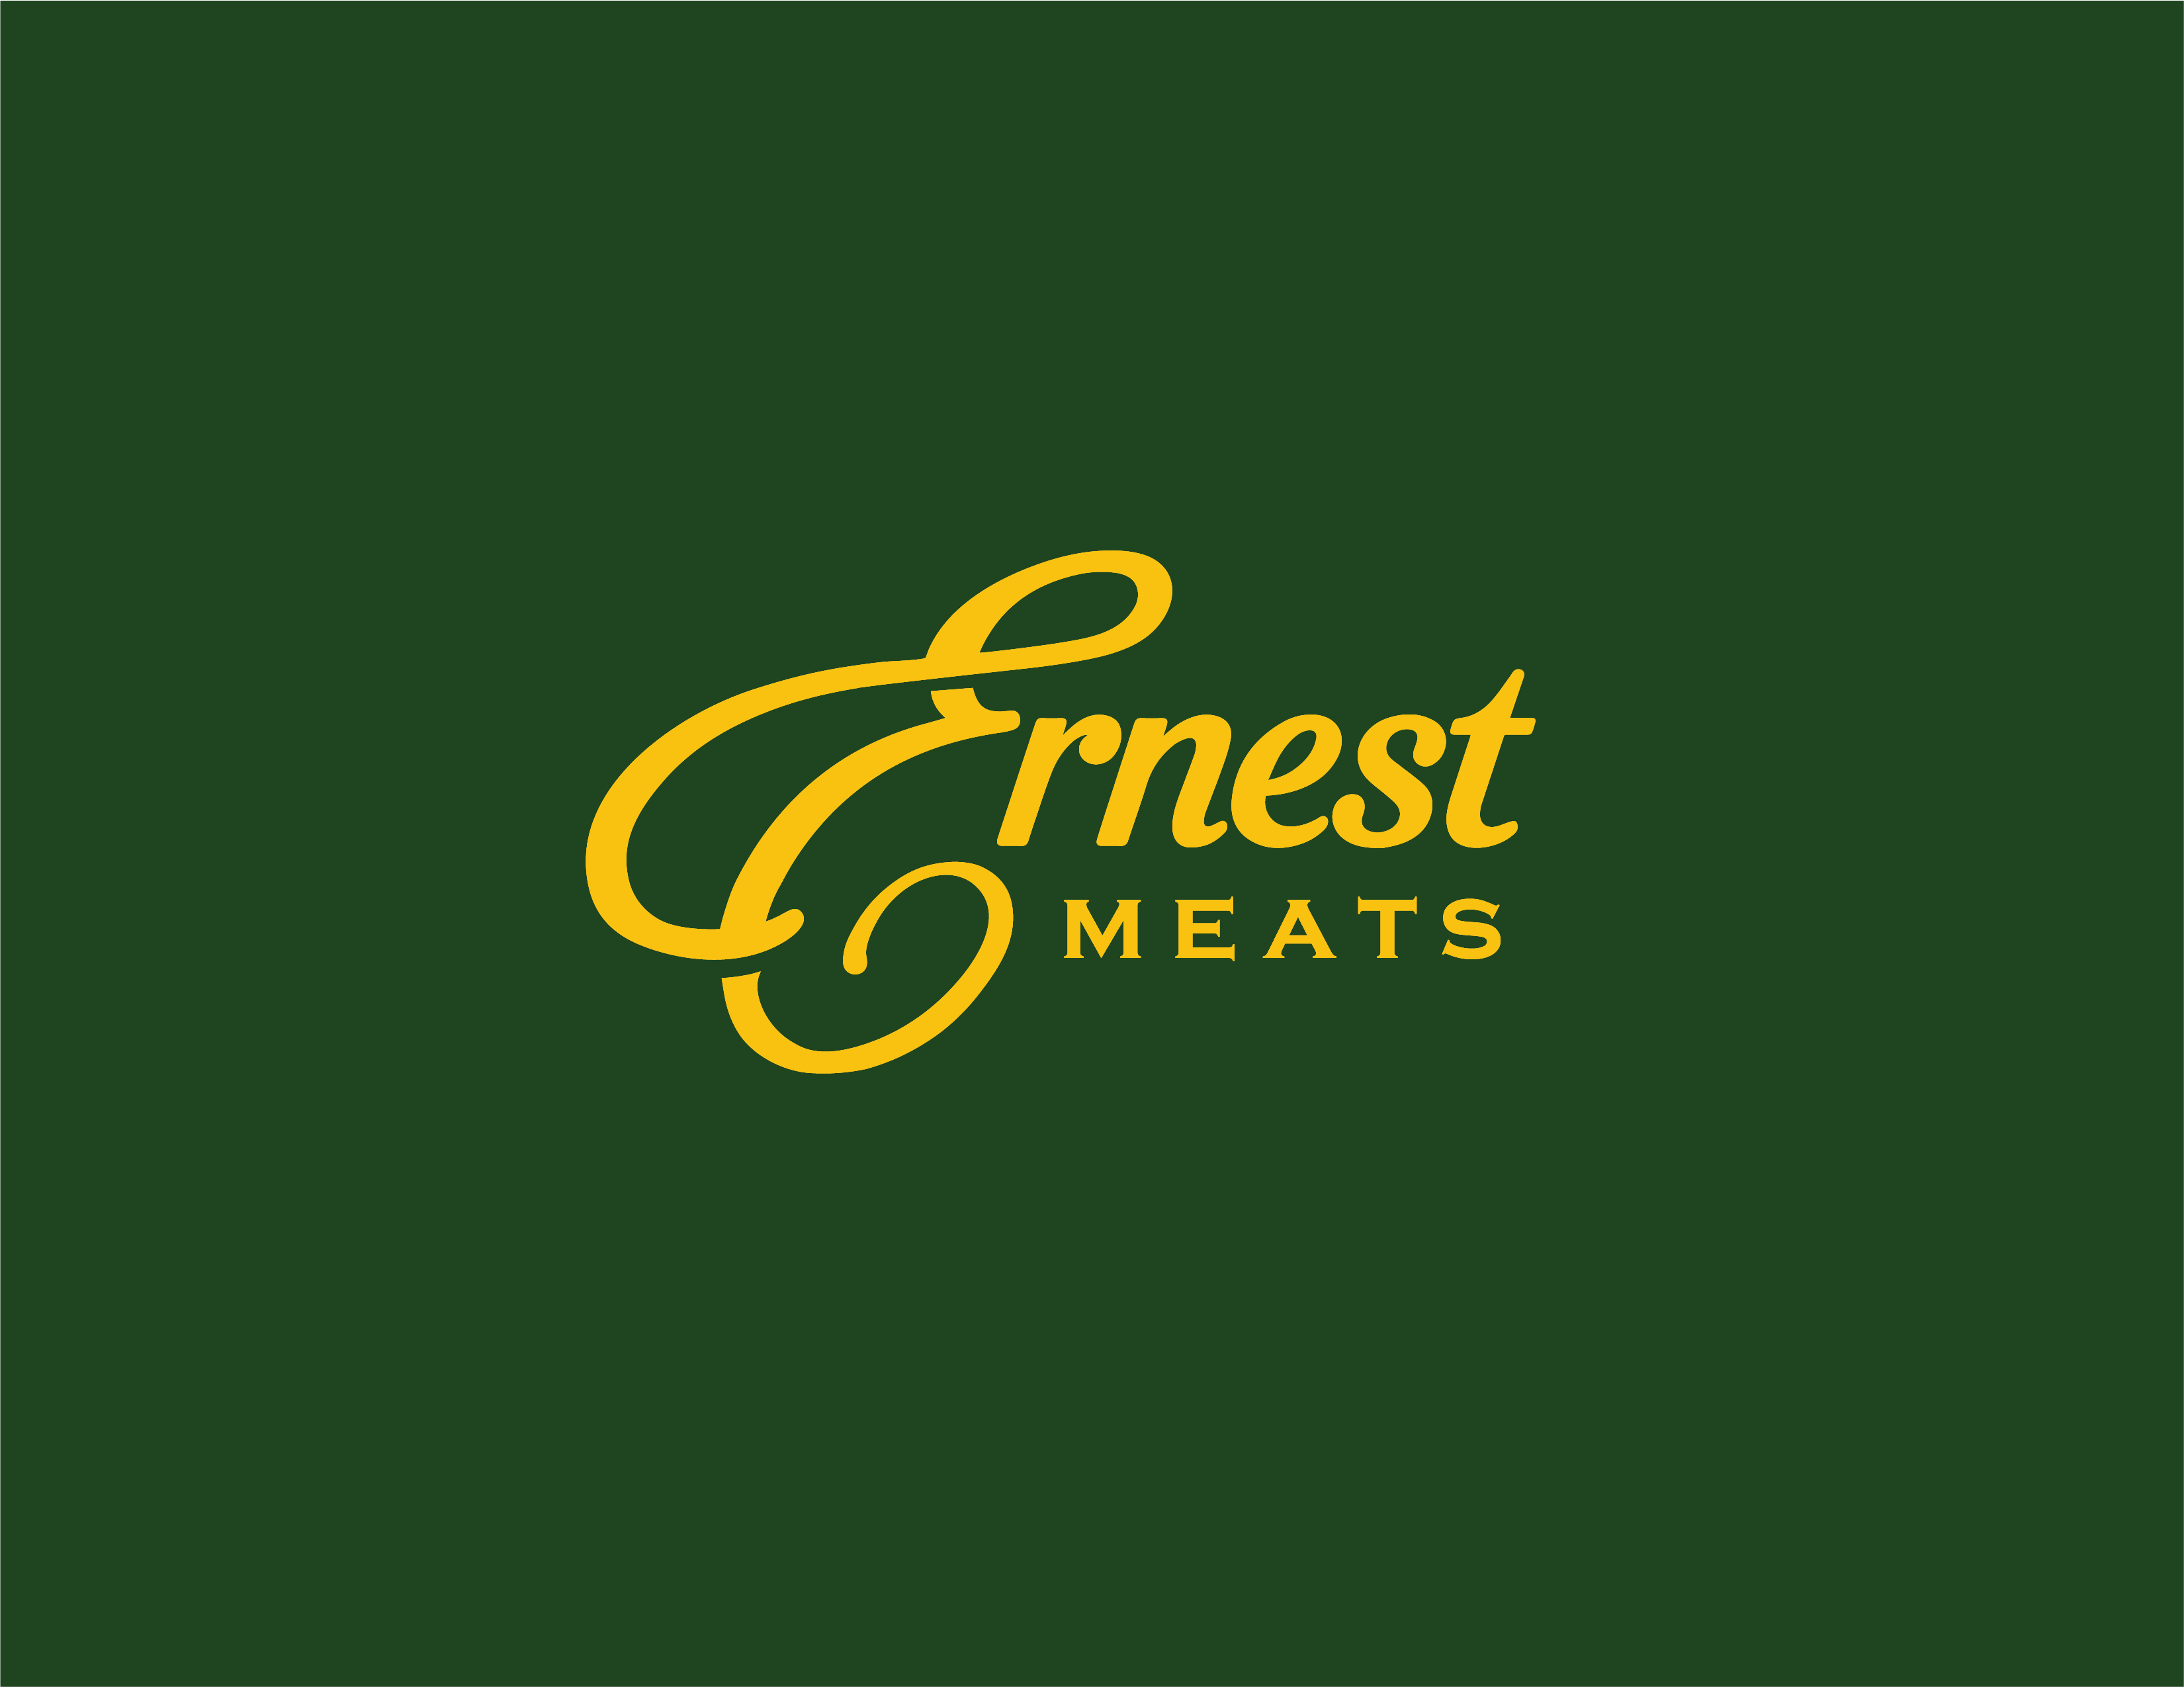 Ernest Meats